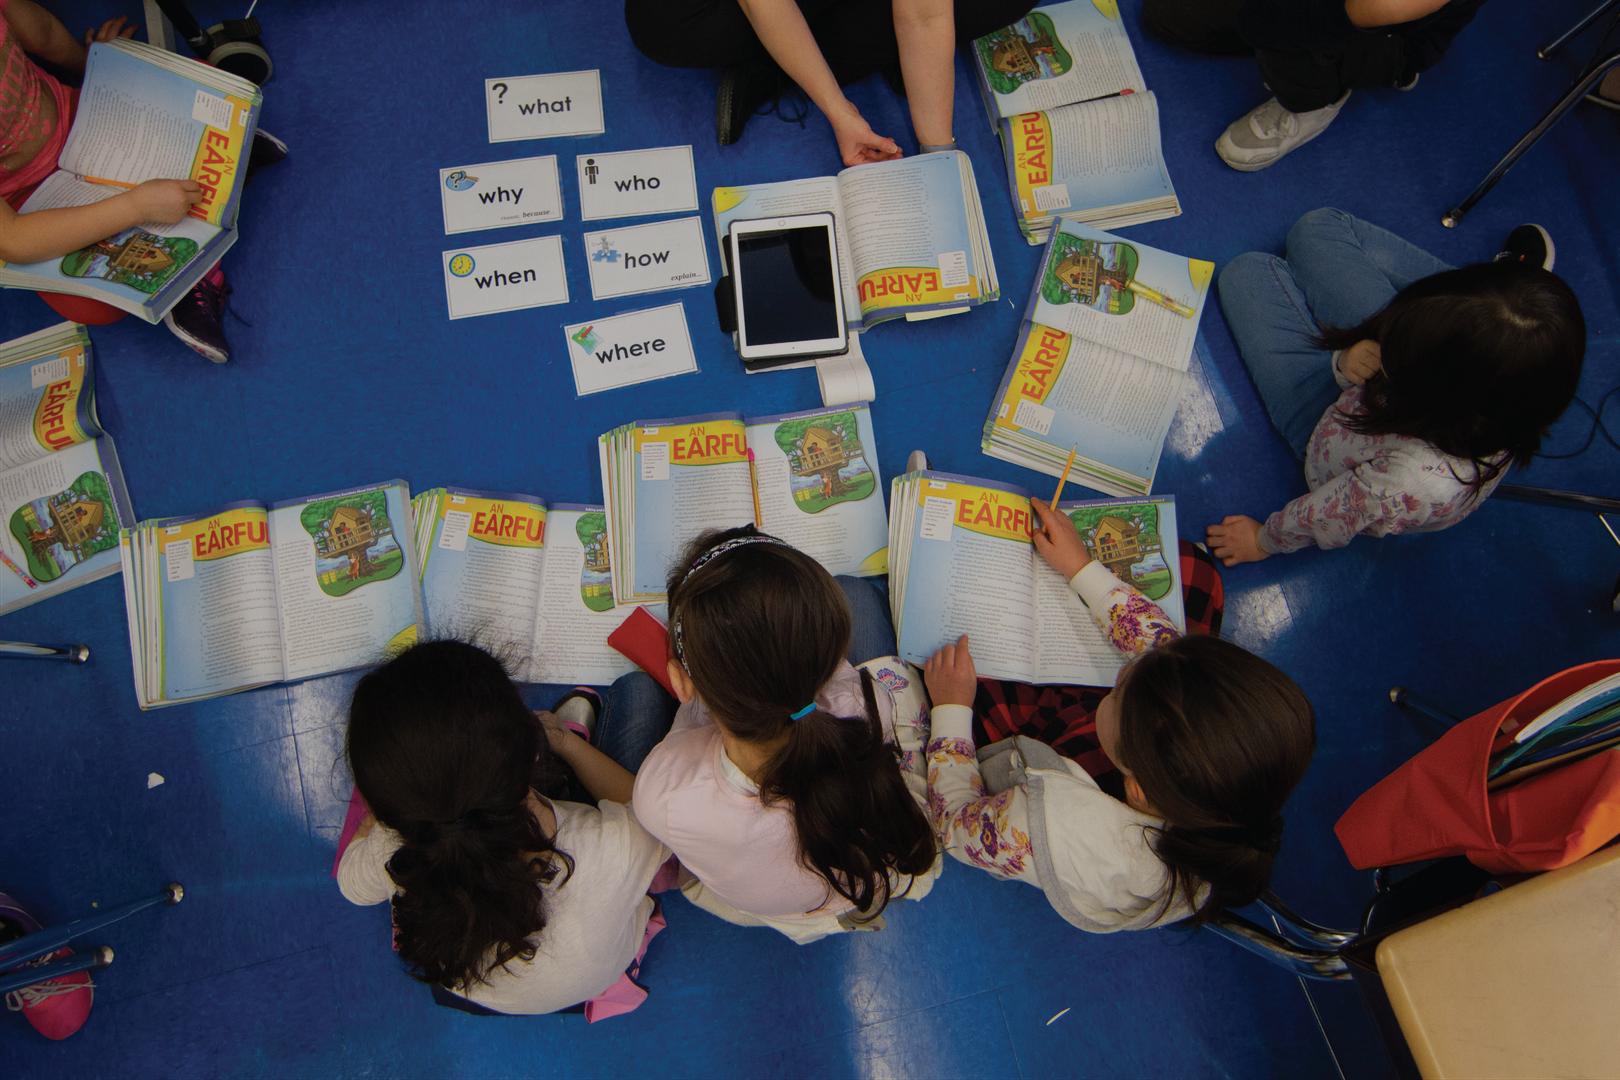 Students gathered around books on floor